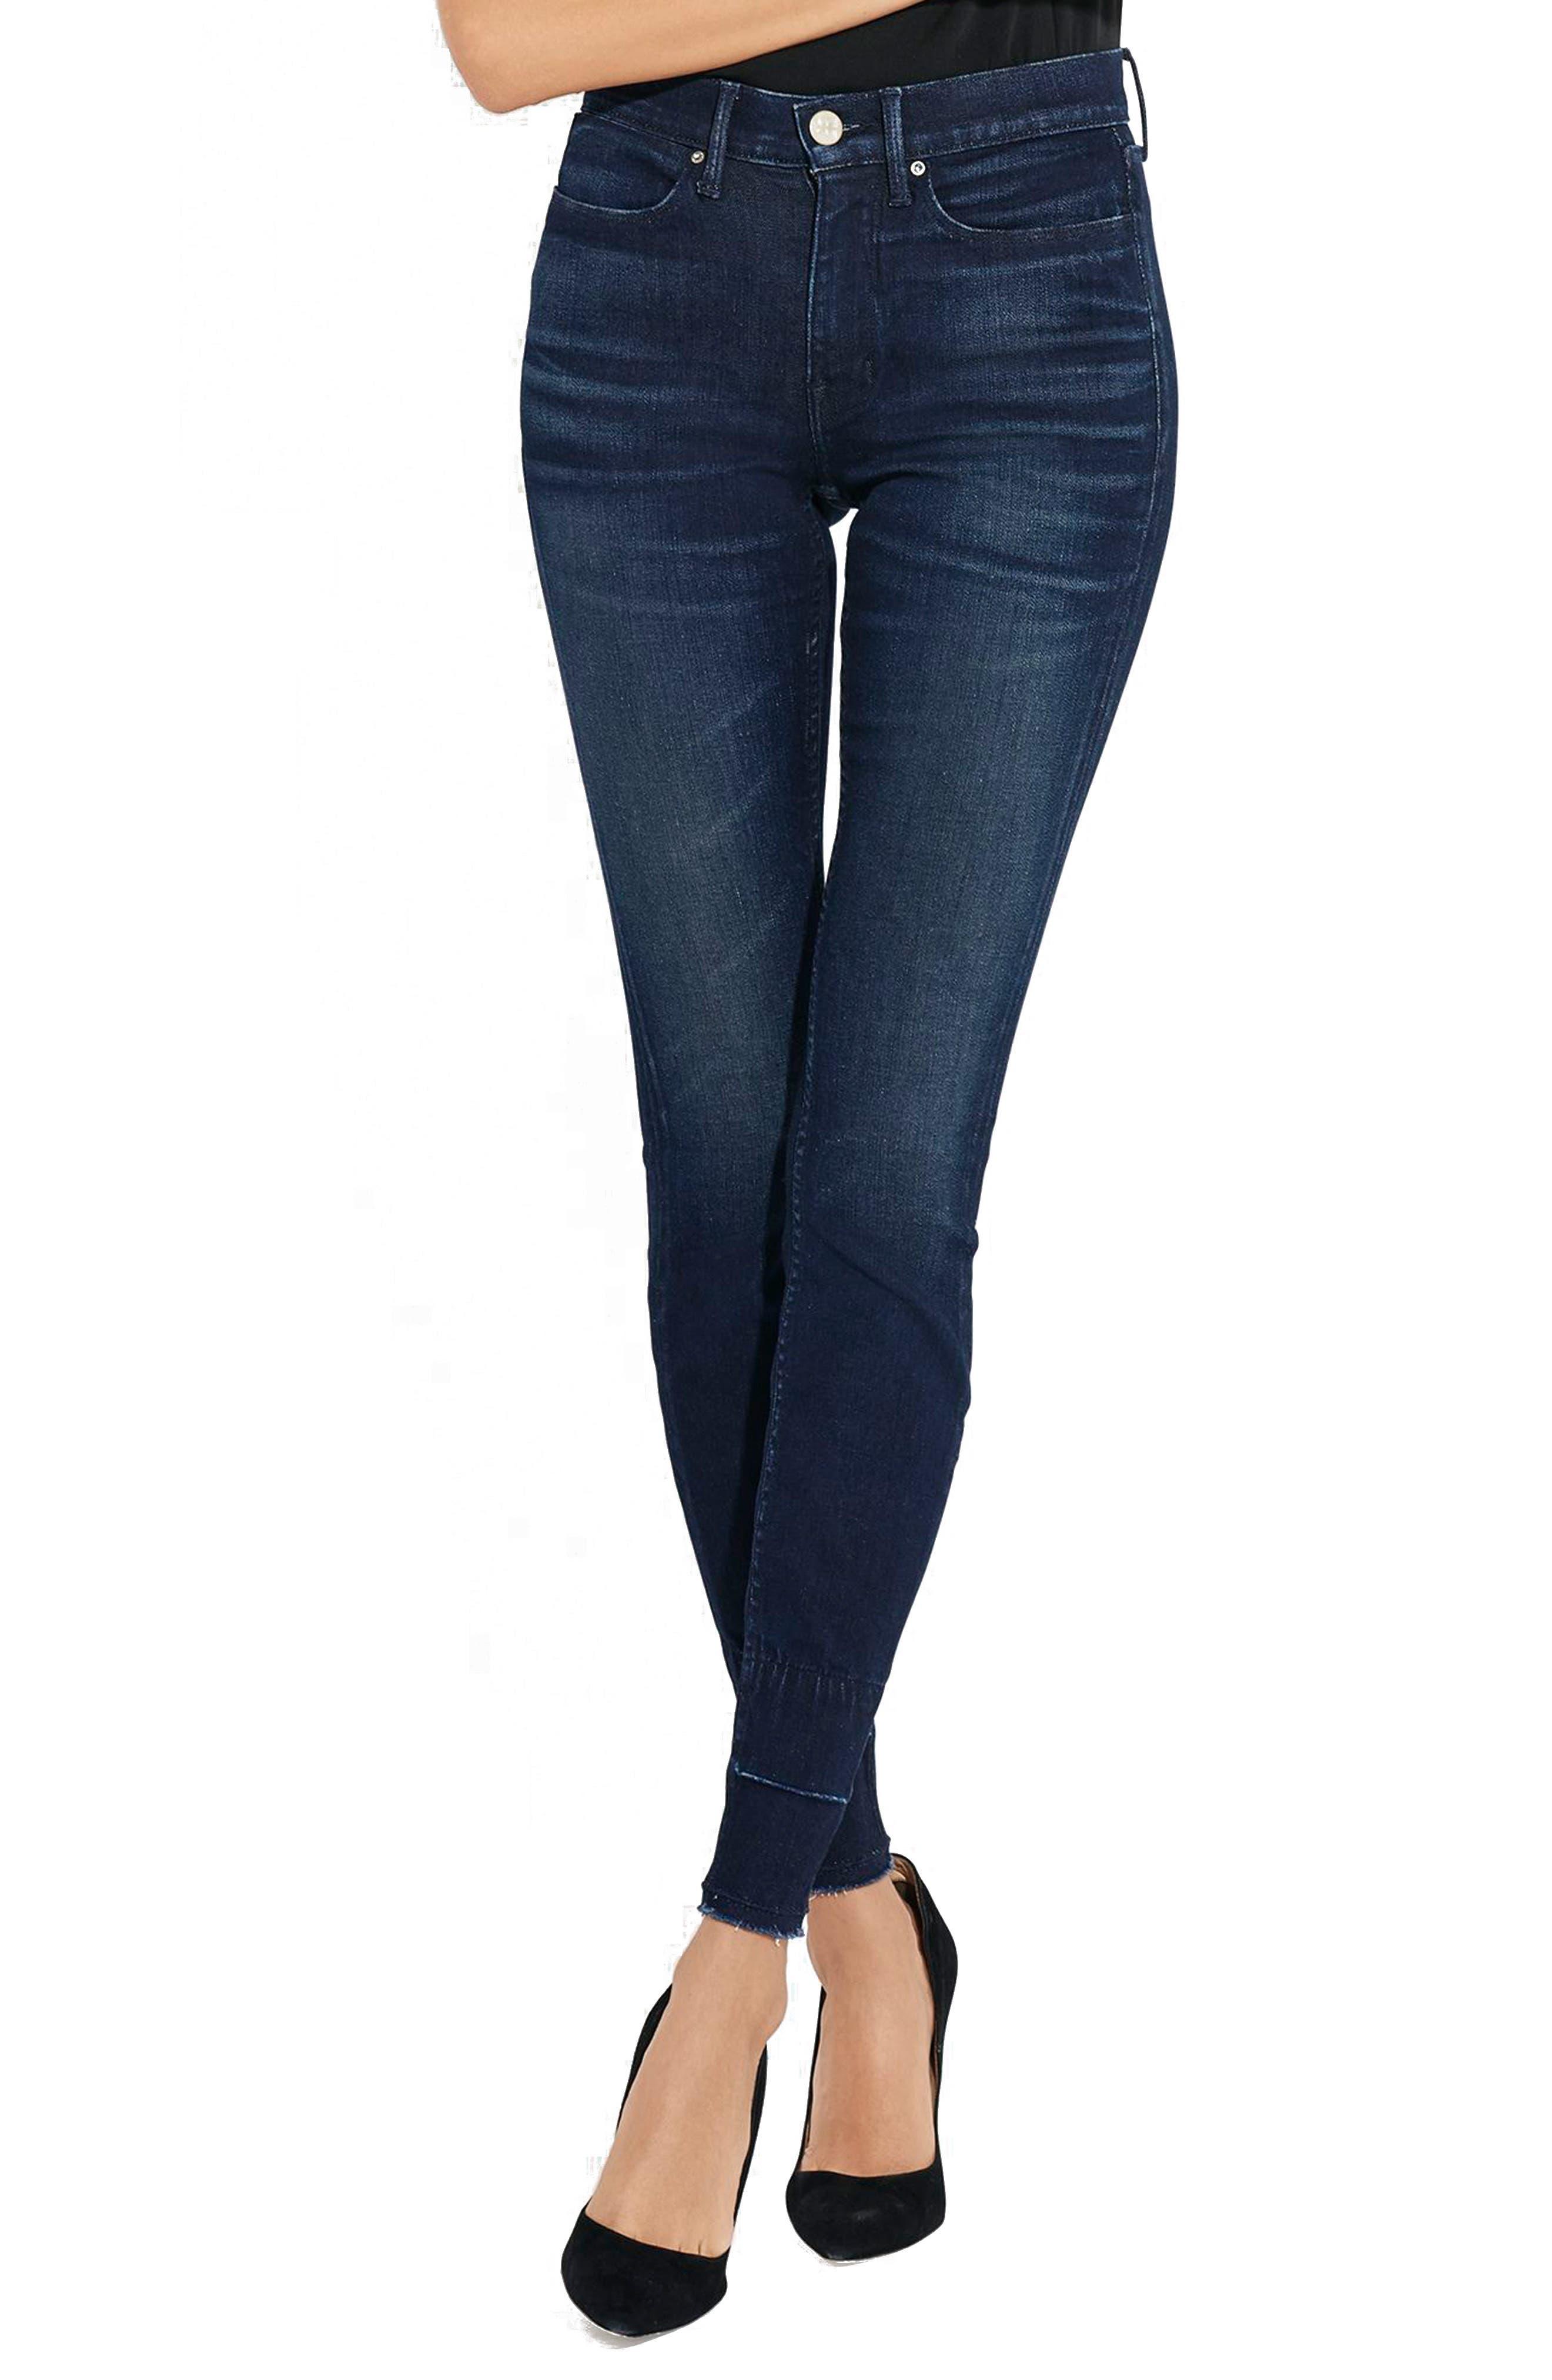 AYR The Skinny Jeans (Casanova)